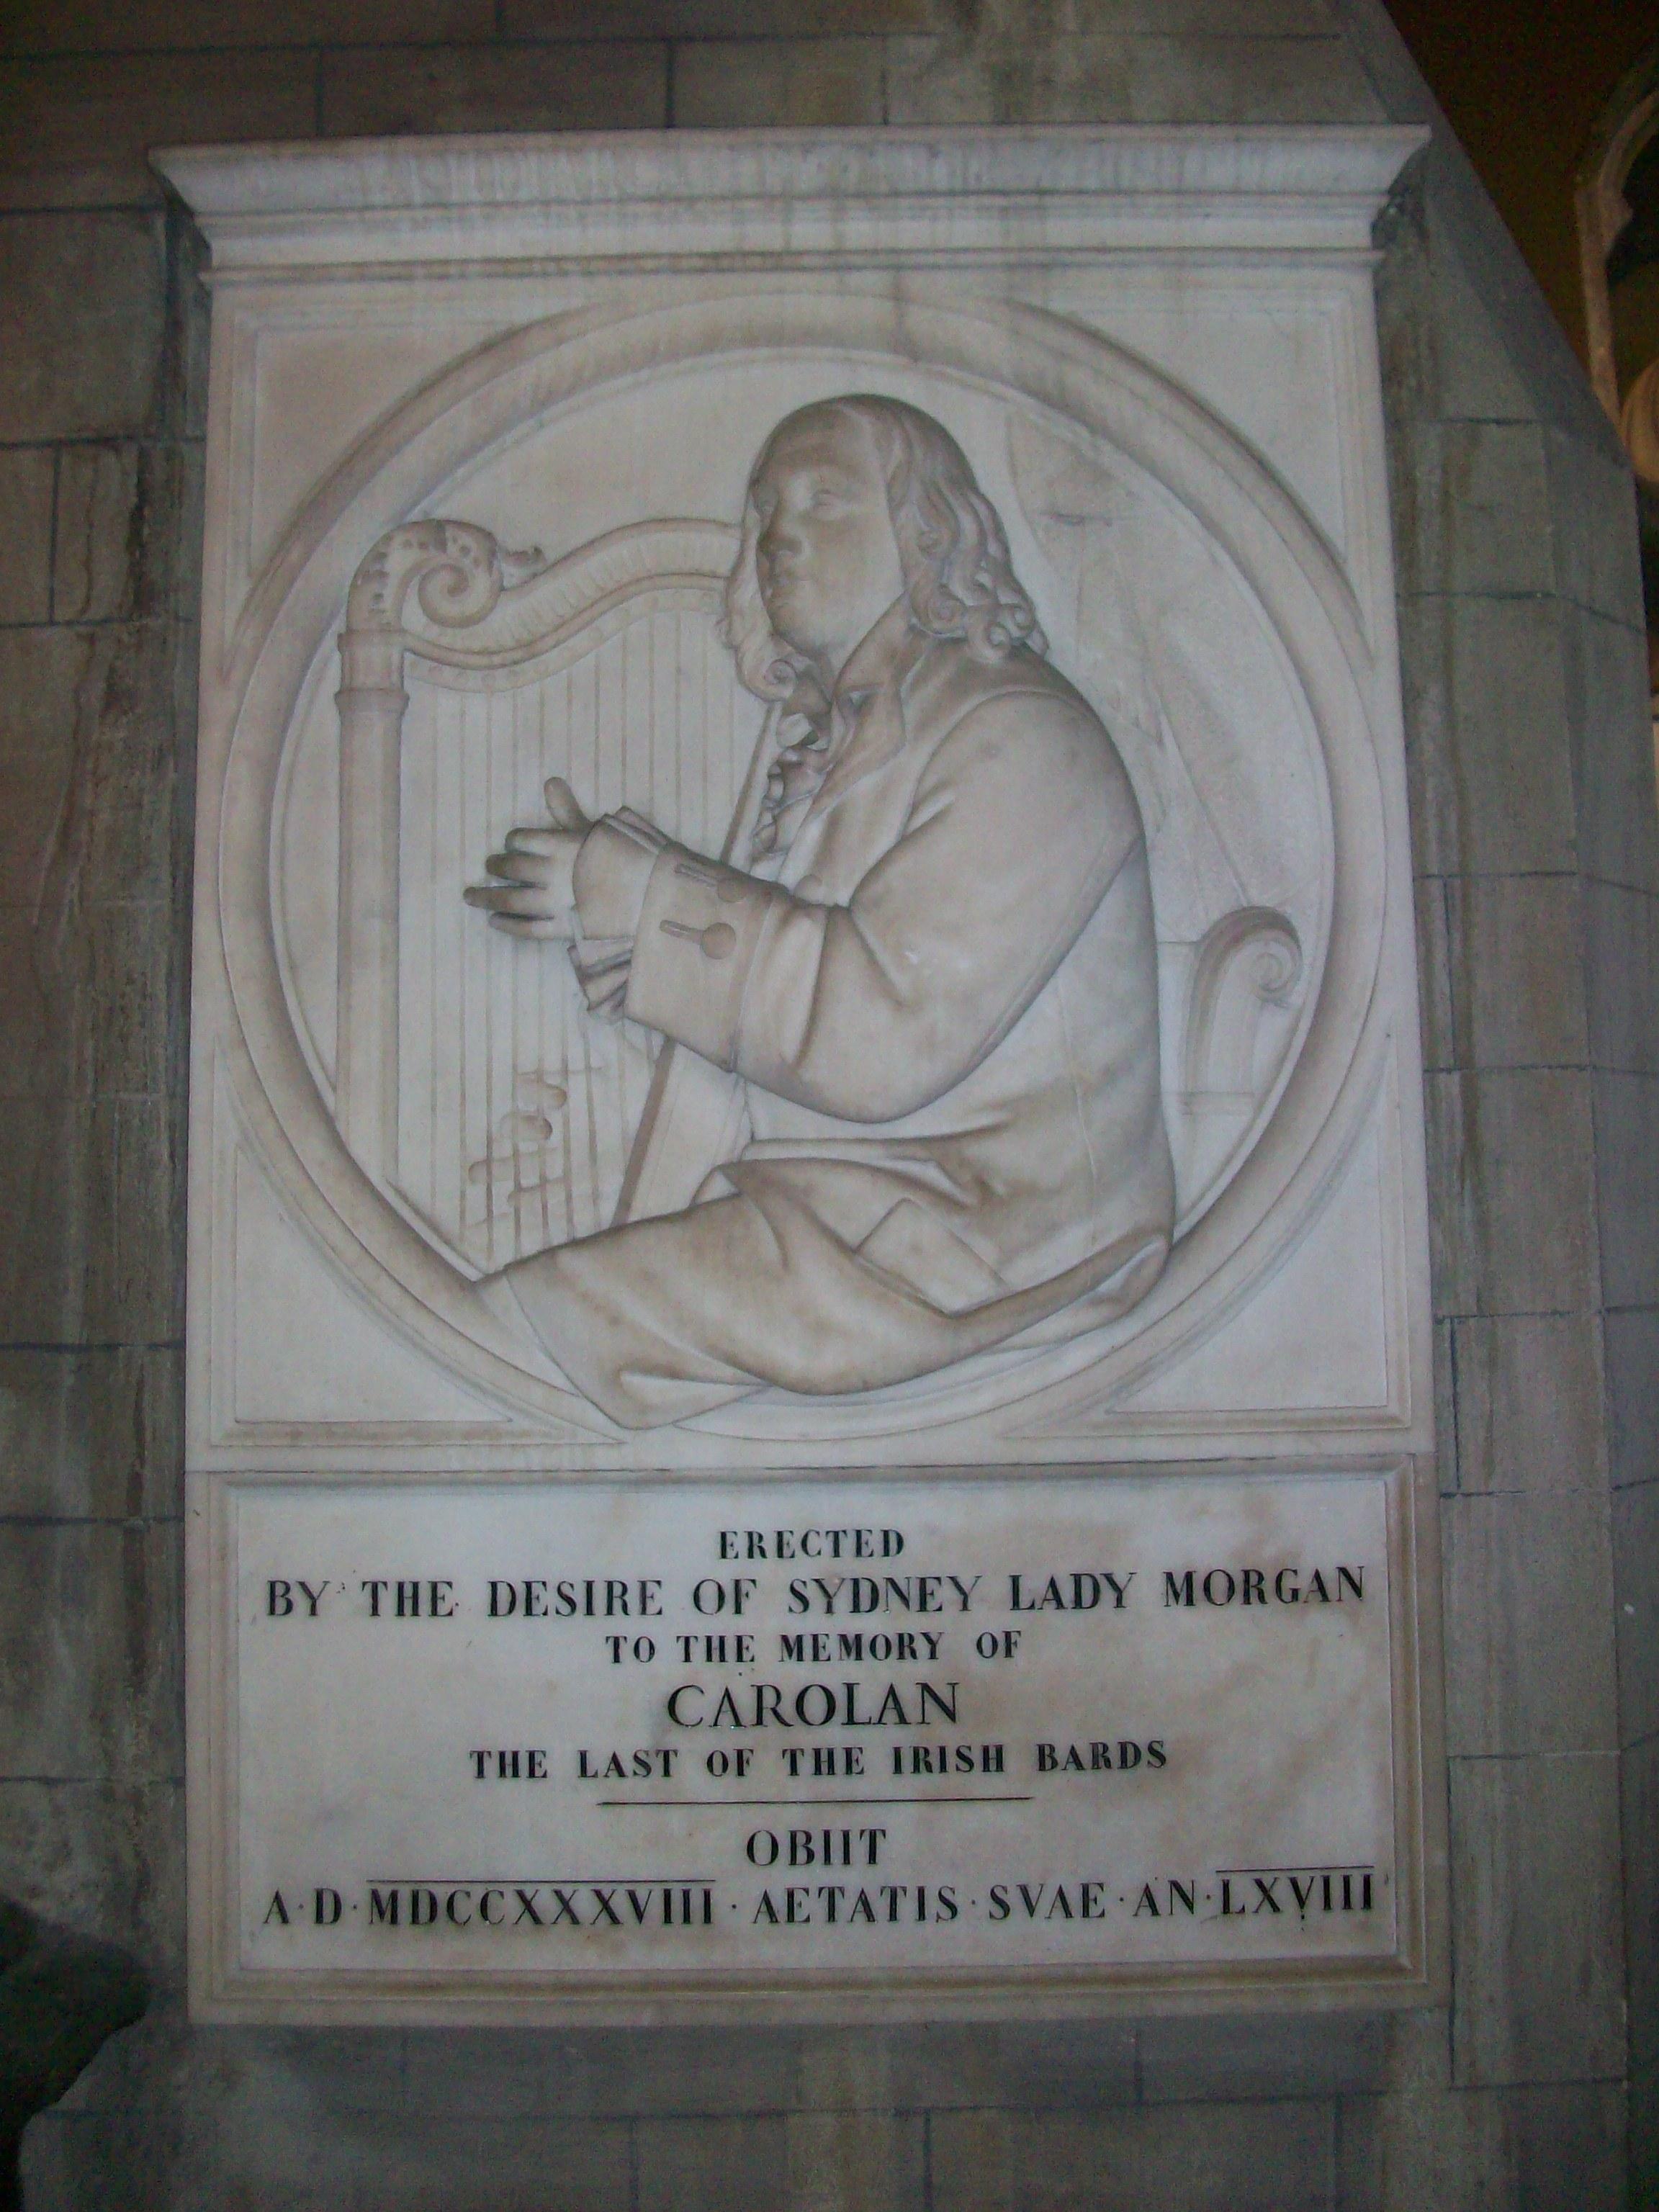 Turlough Carolan memorial